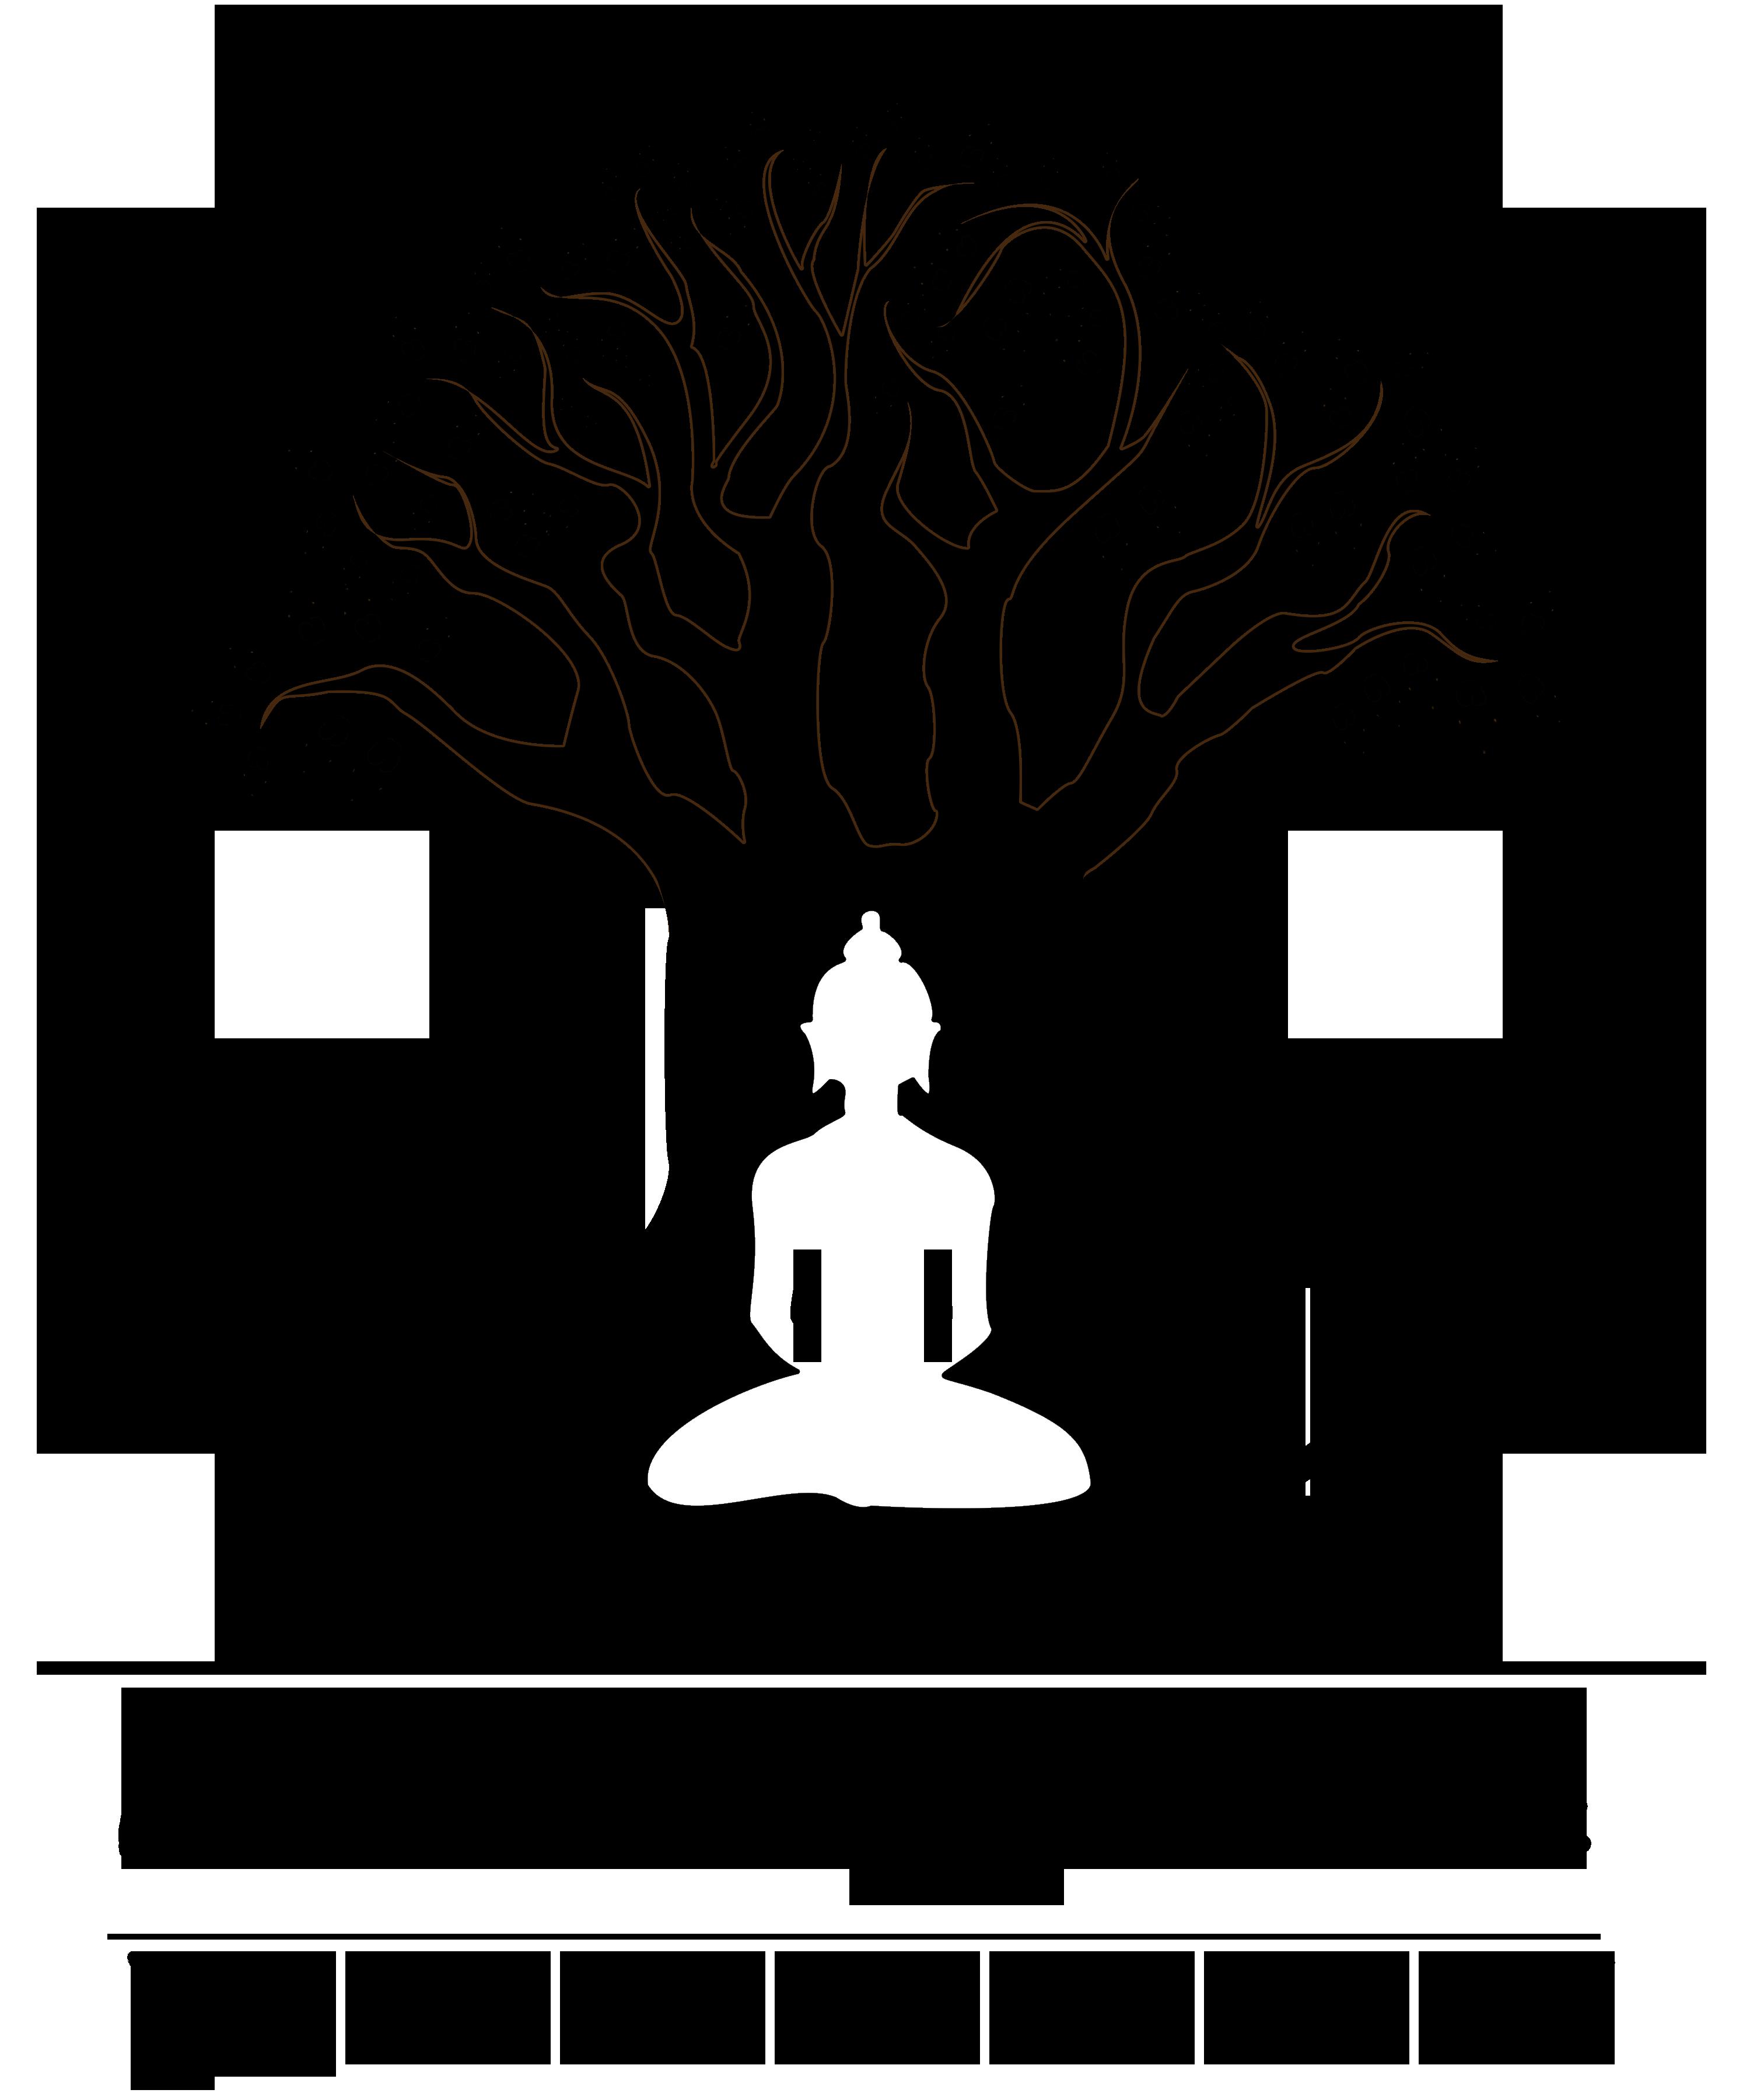 3000x3600 Rough Logos Bodhi Tree Trading Co. On Behance